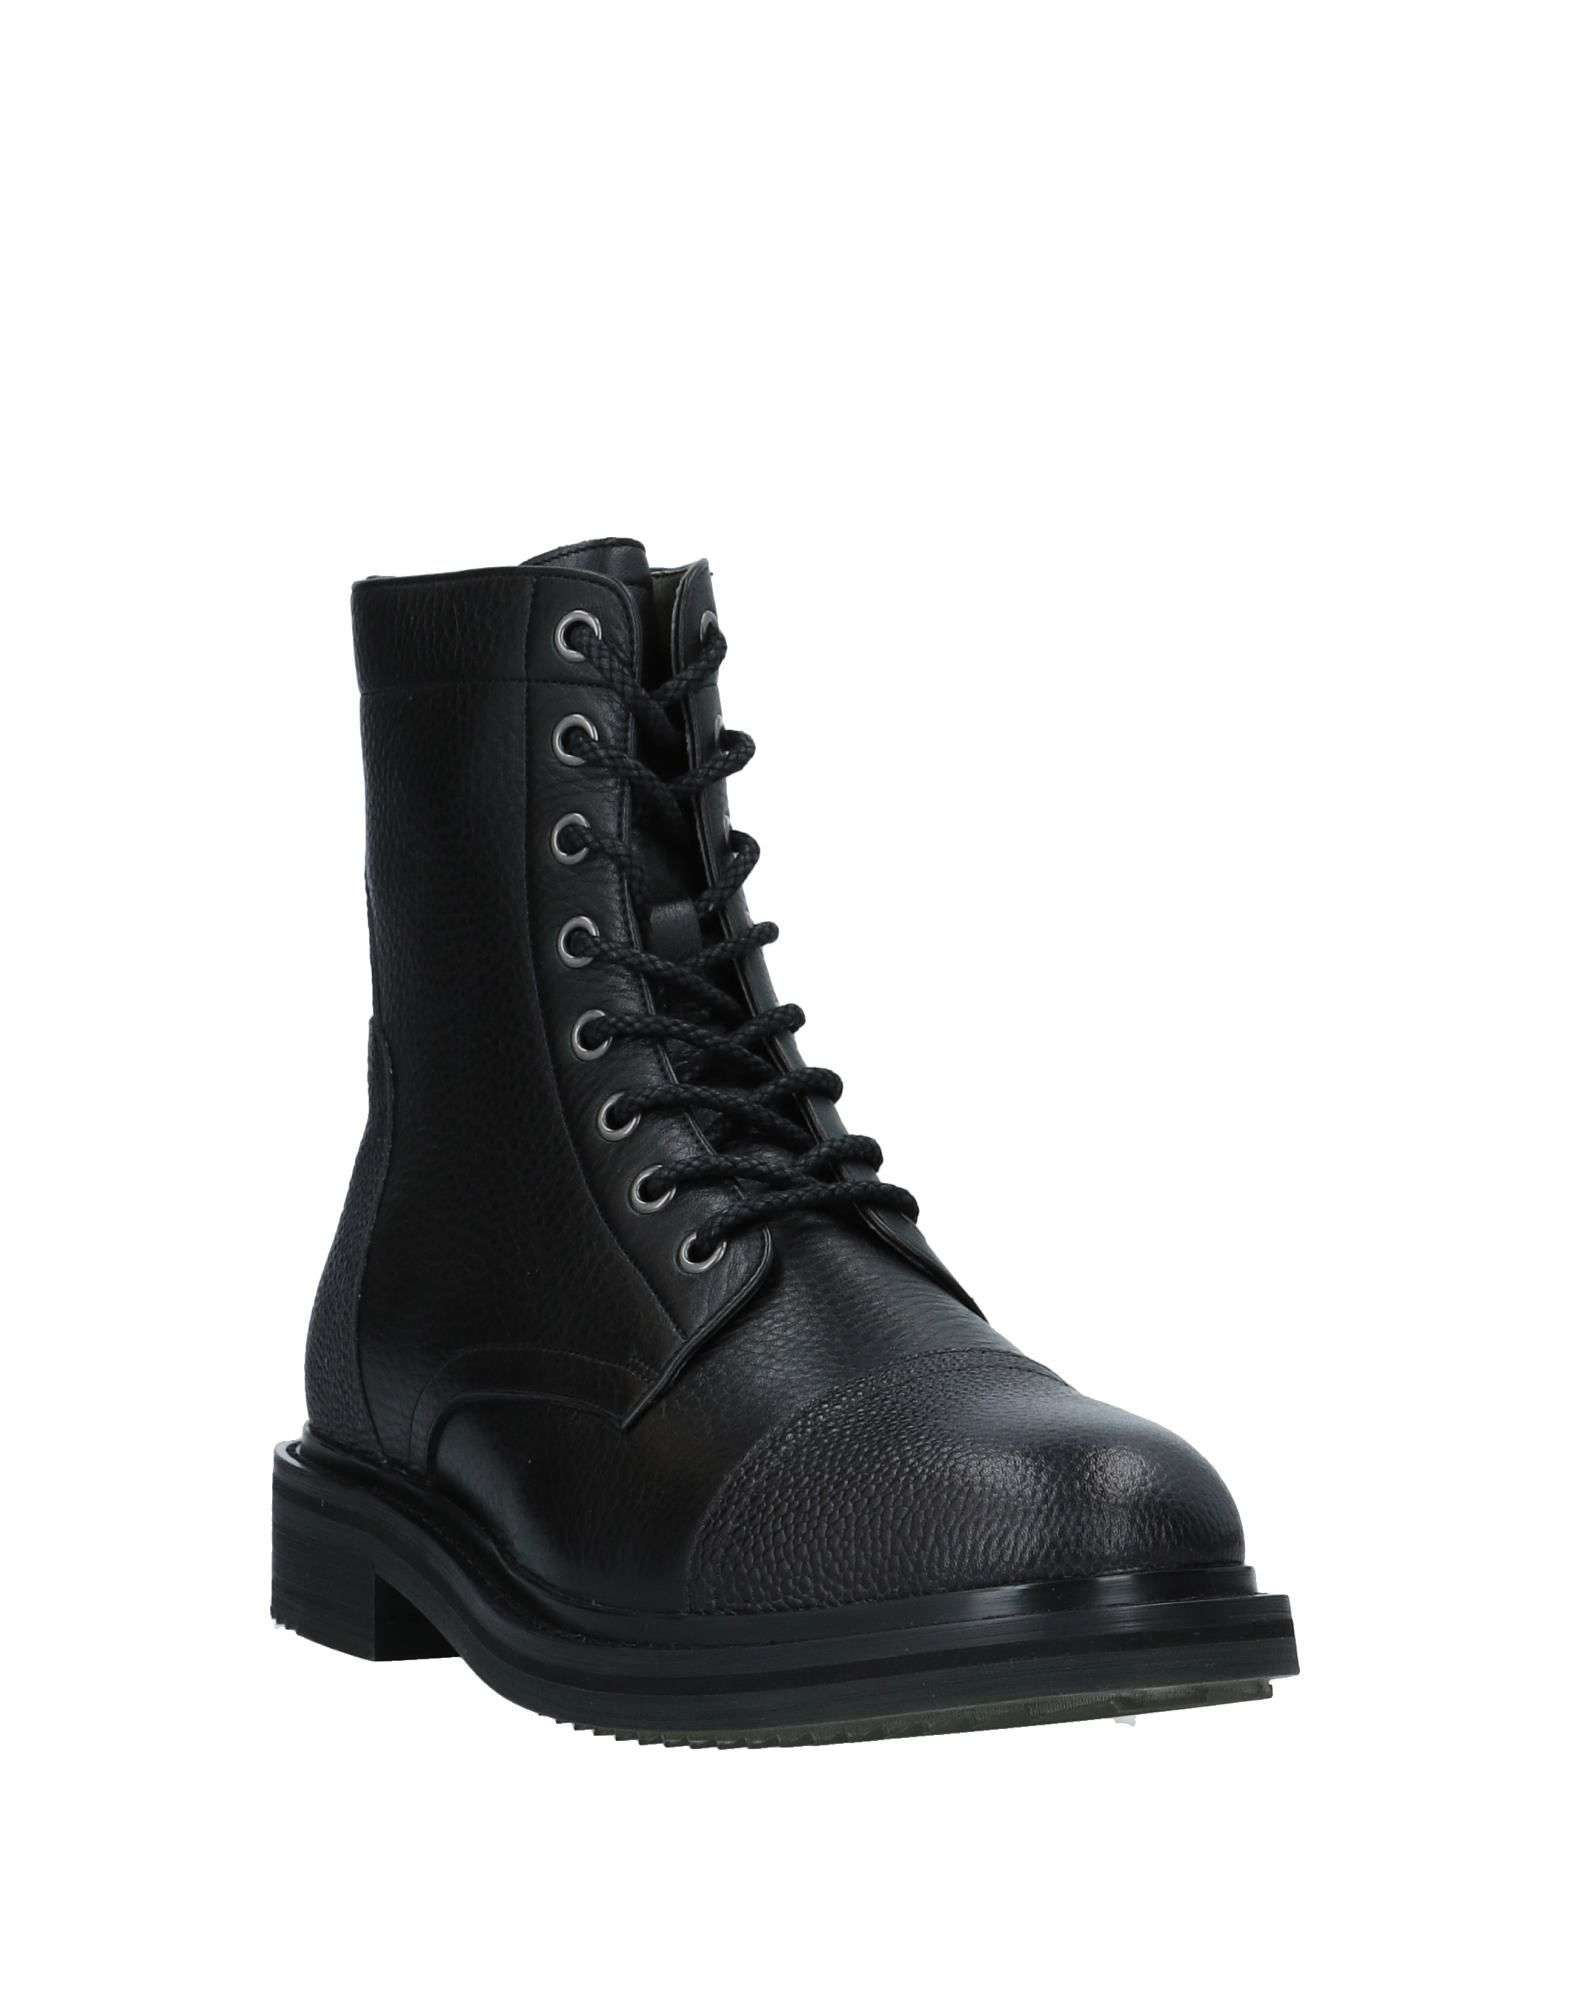 John Varvatos ★ U.S.A. Boots - Men Men Men John Varvatos ★ U.S.A. Boots online on  United Kingdom - 11535894LL 1d76ed